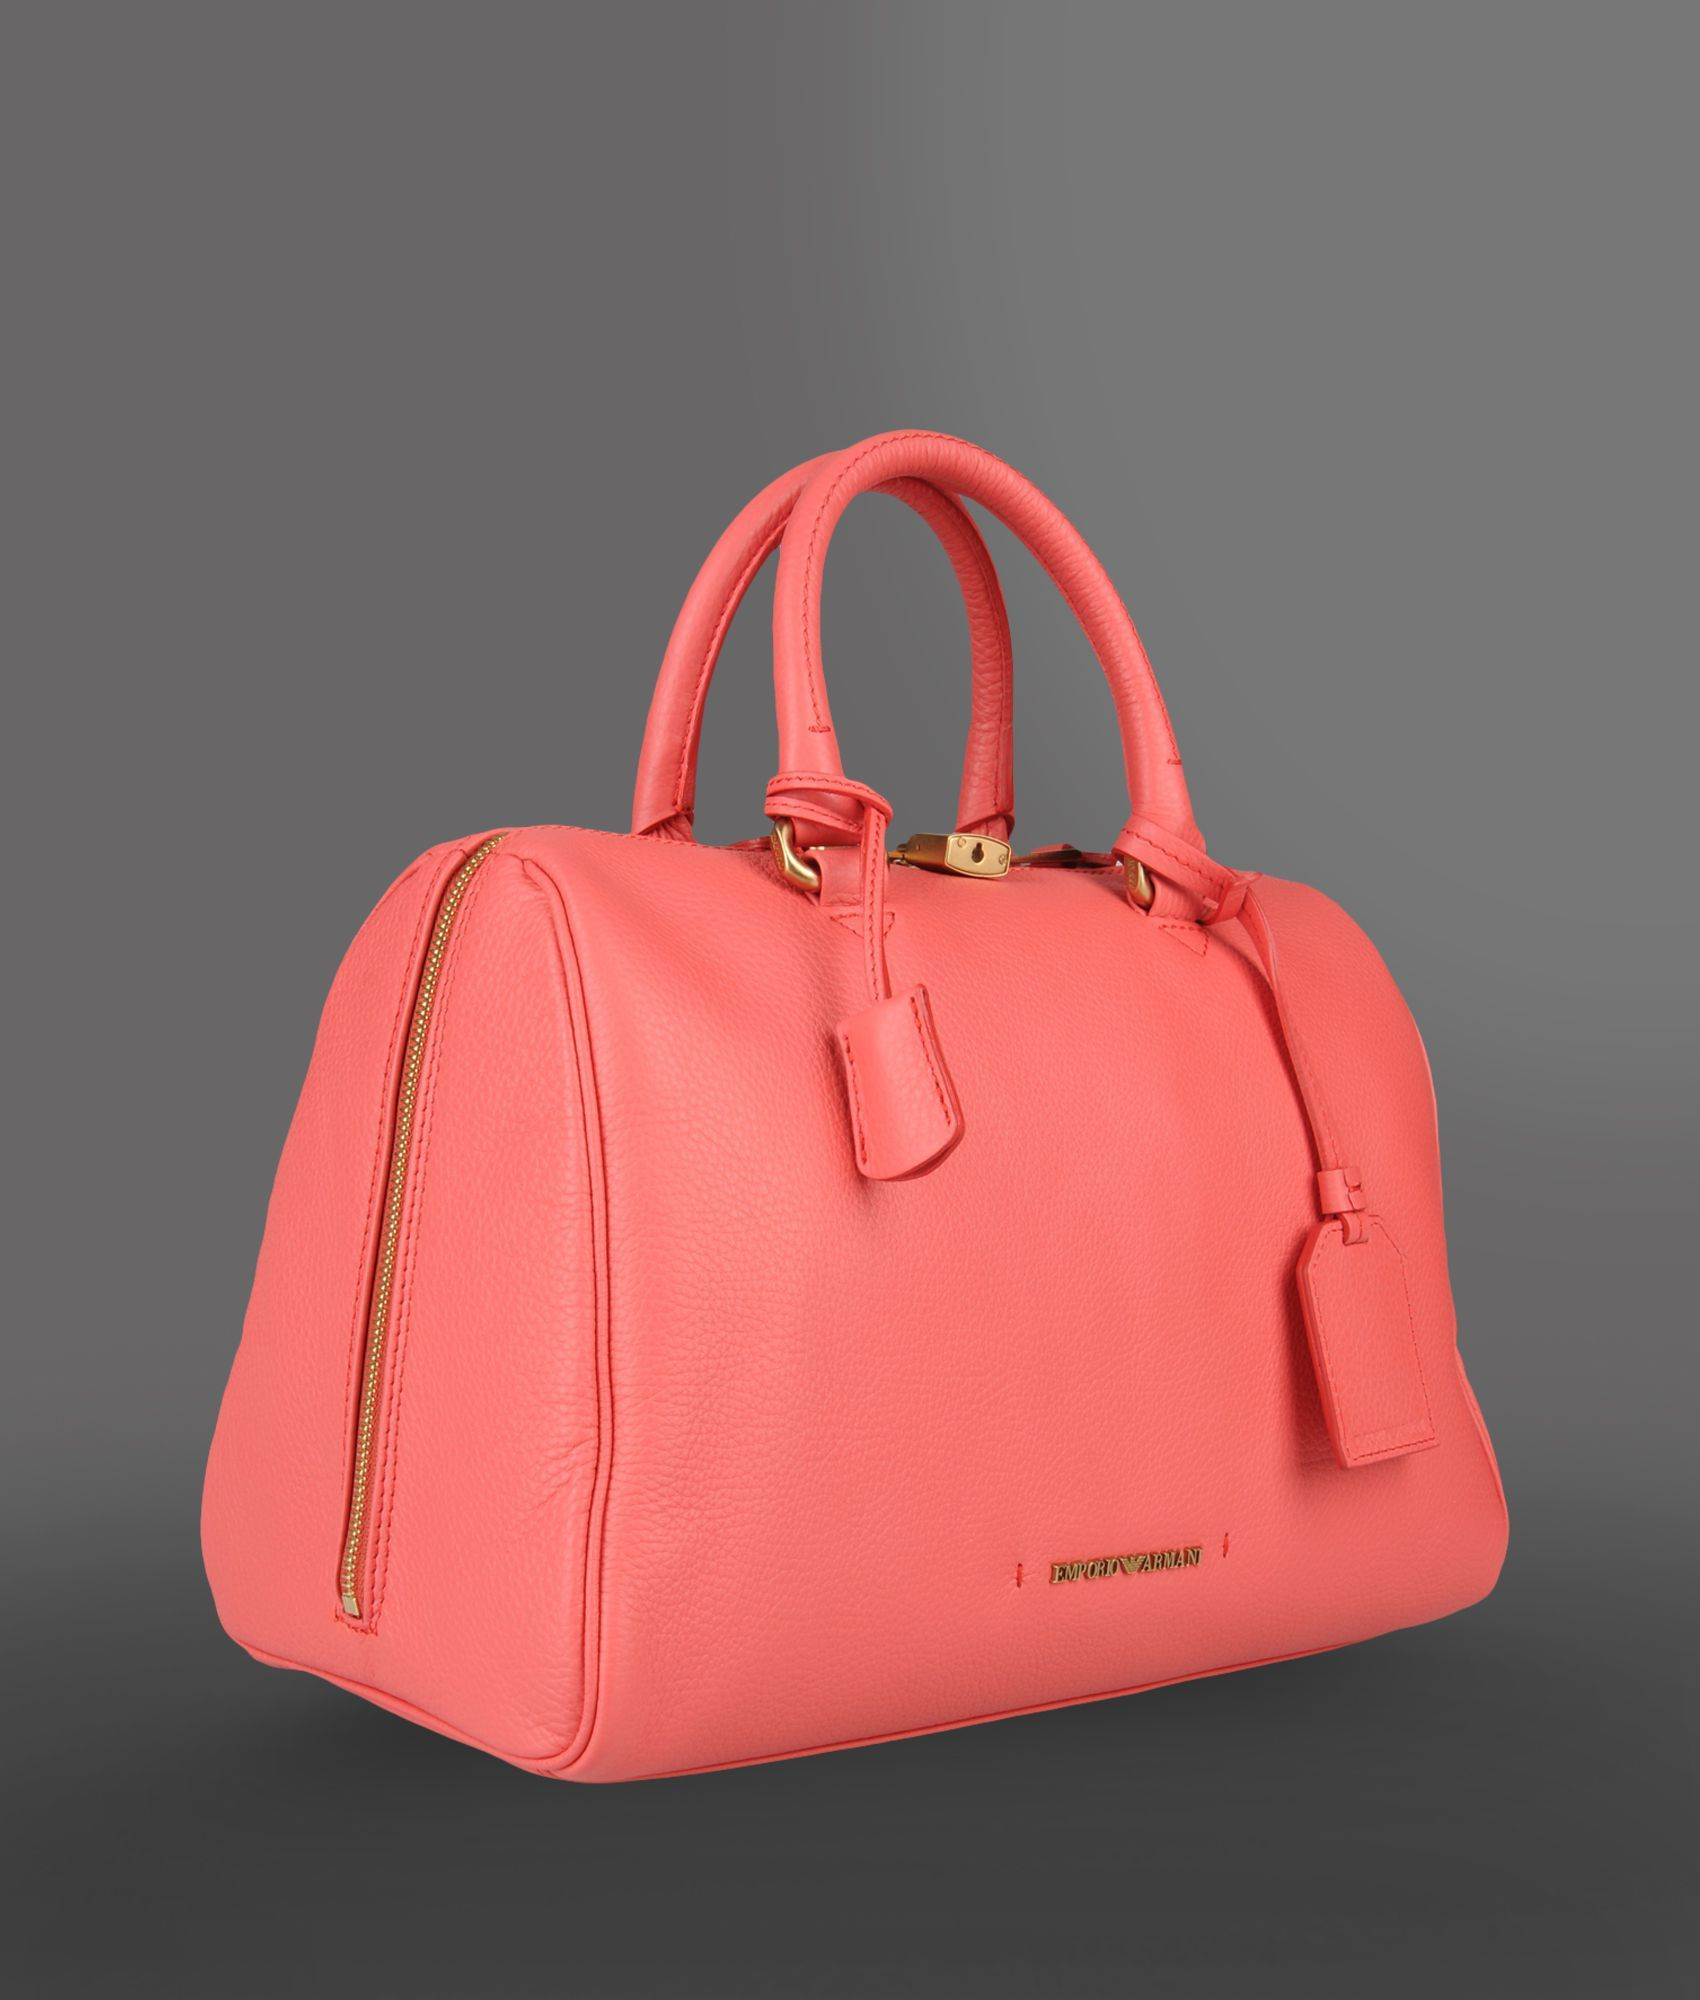 d839f5abf40d4 Emporio Armani Bag in Pink  3